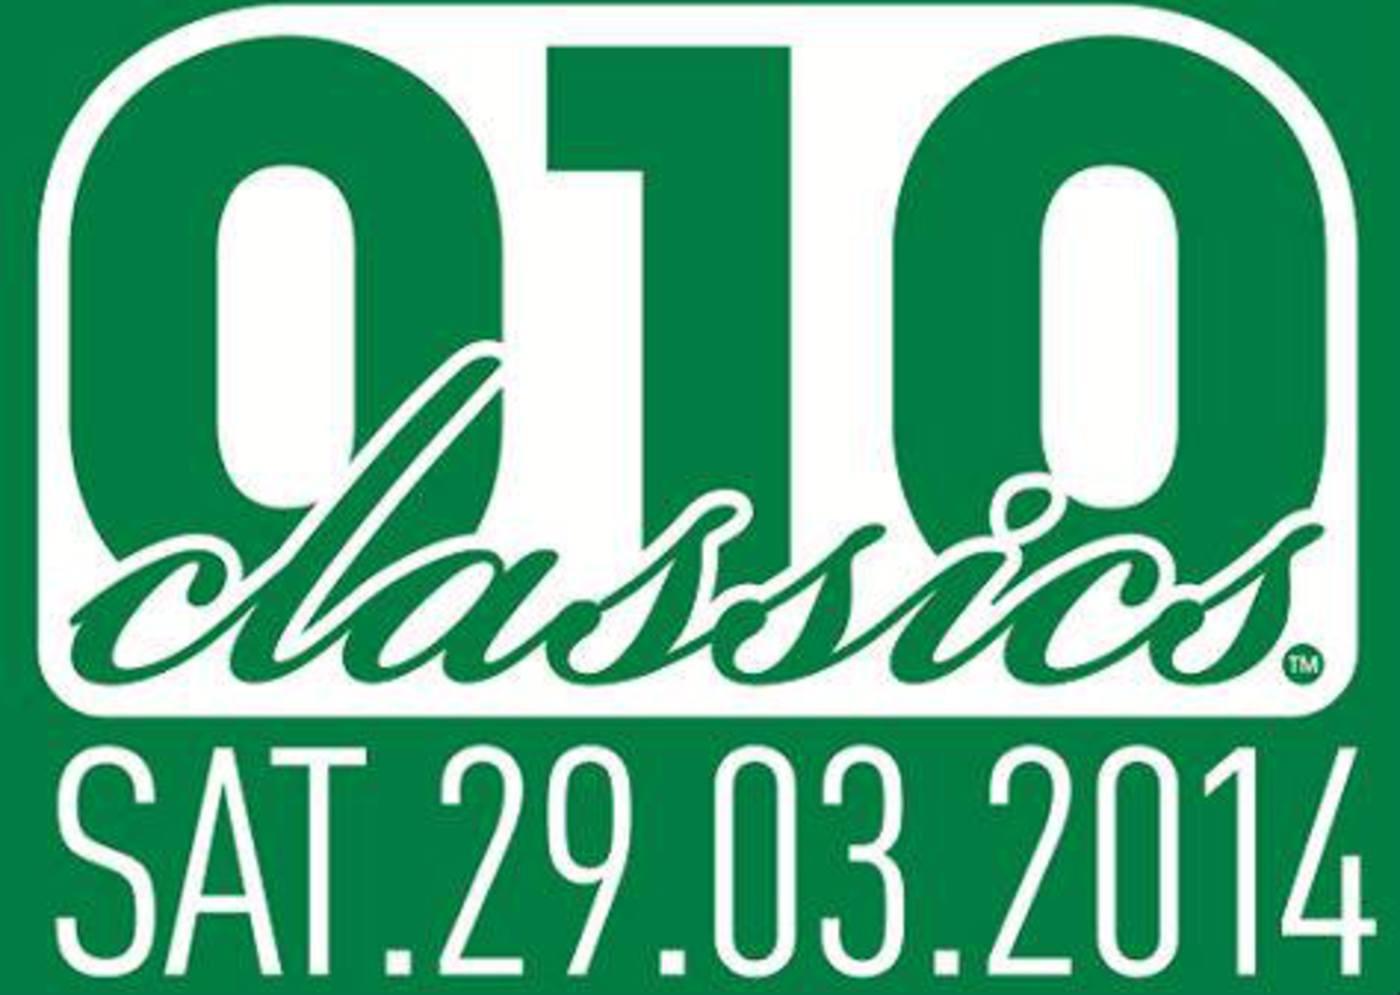 010Classics - Podcast